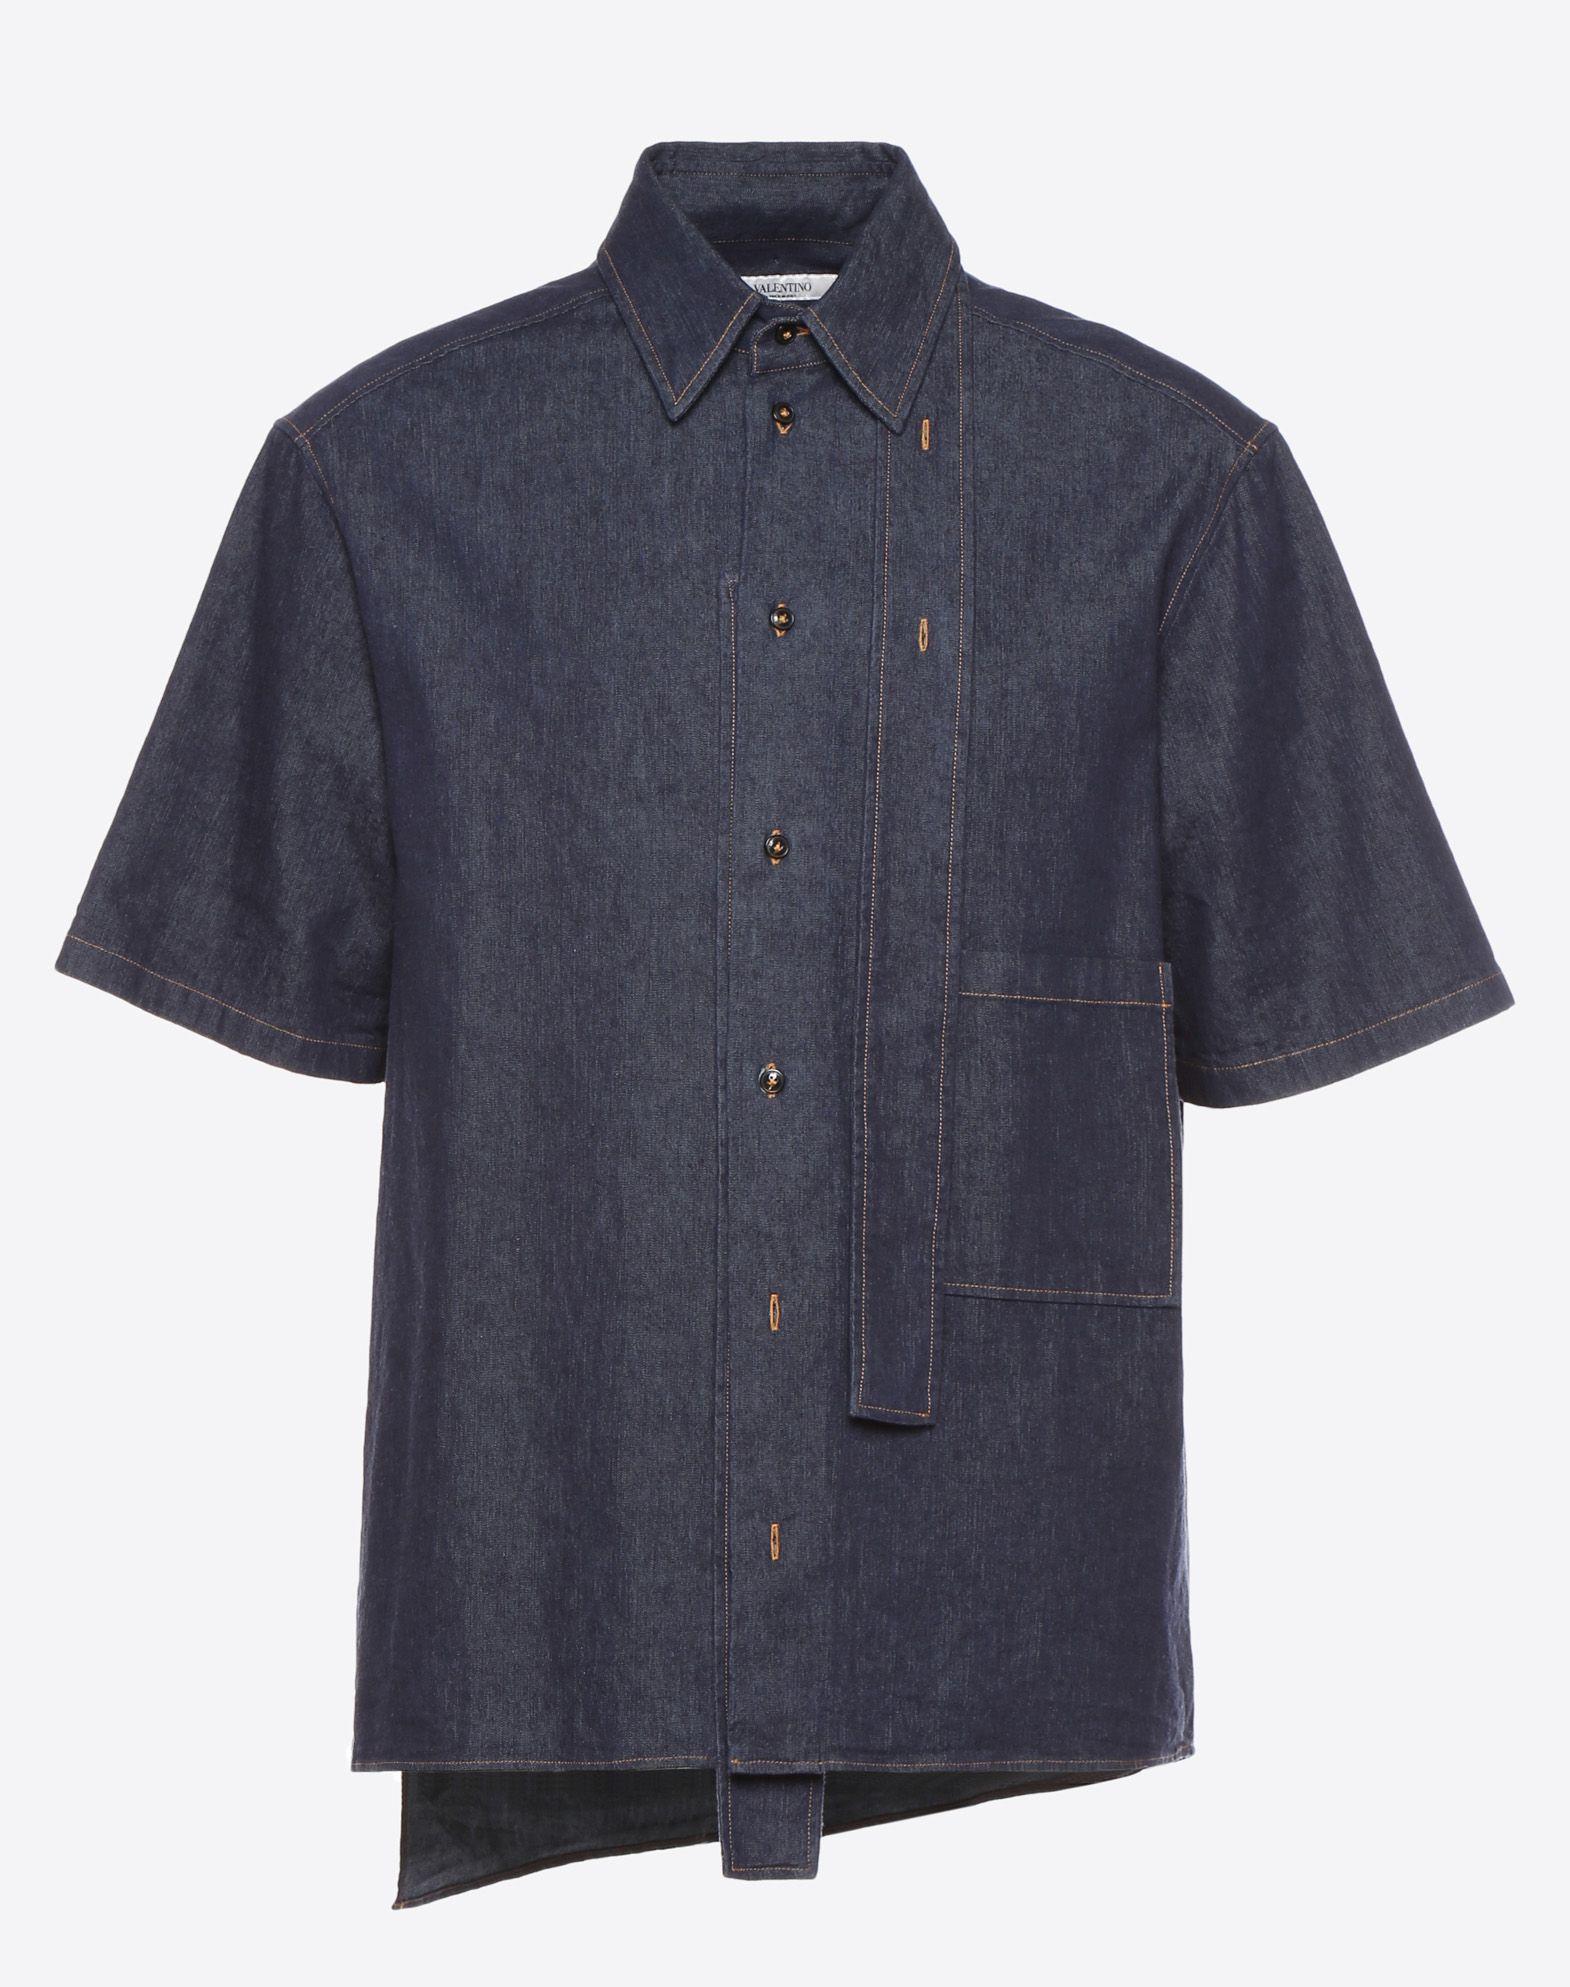 VALENTINO Classic Neckline Single chest pocket Button closing Short sleeves  12149218ra